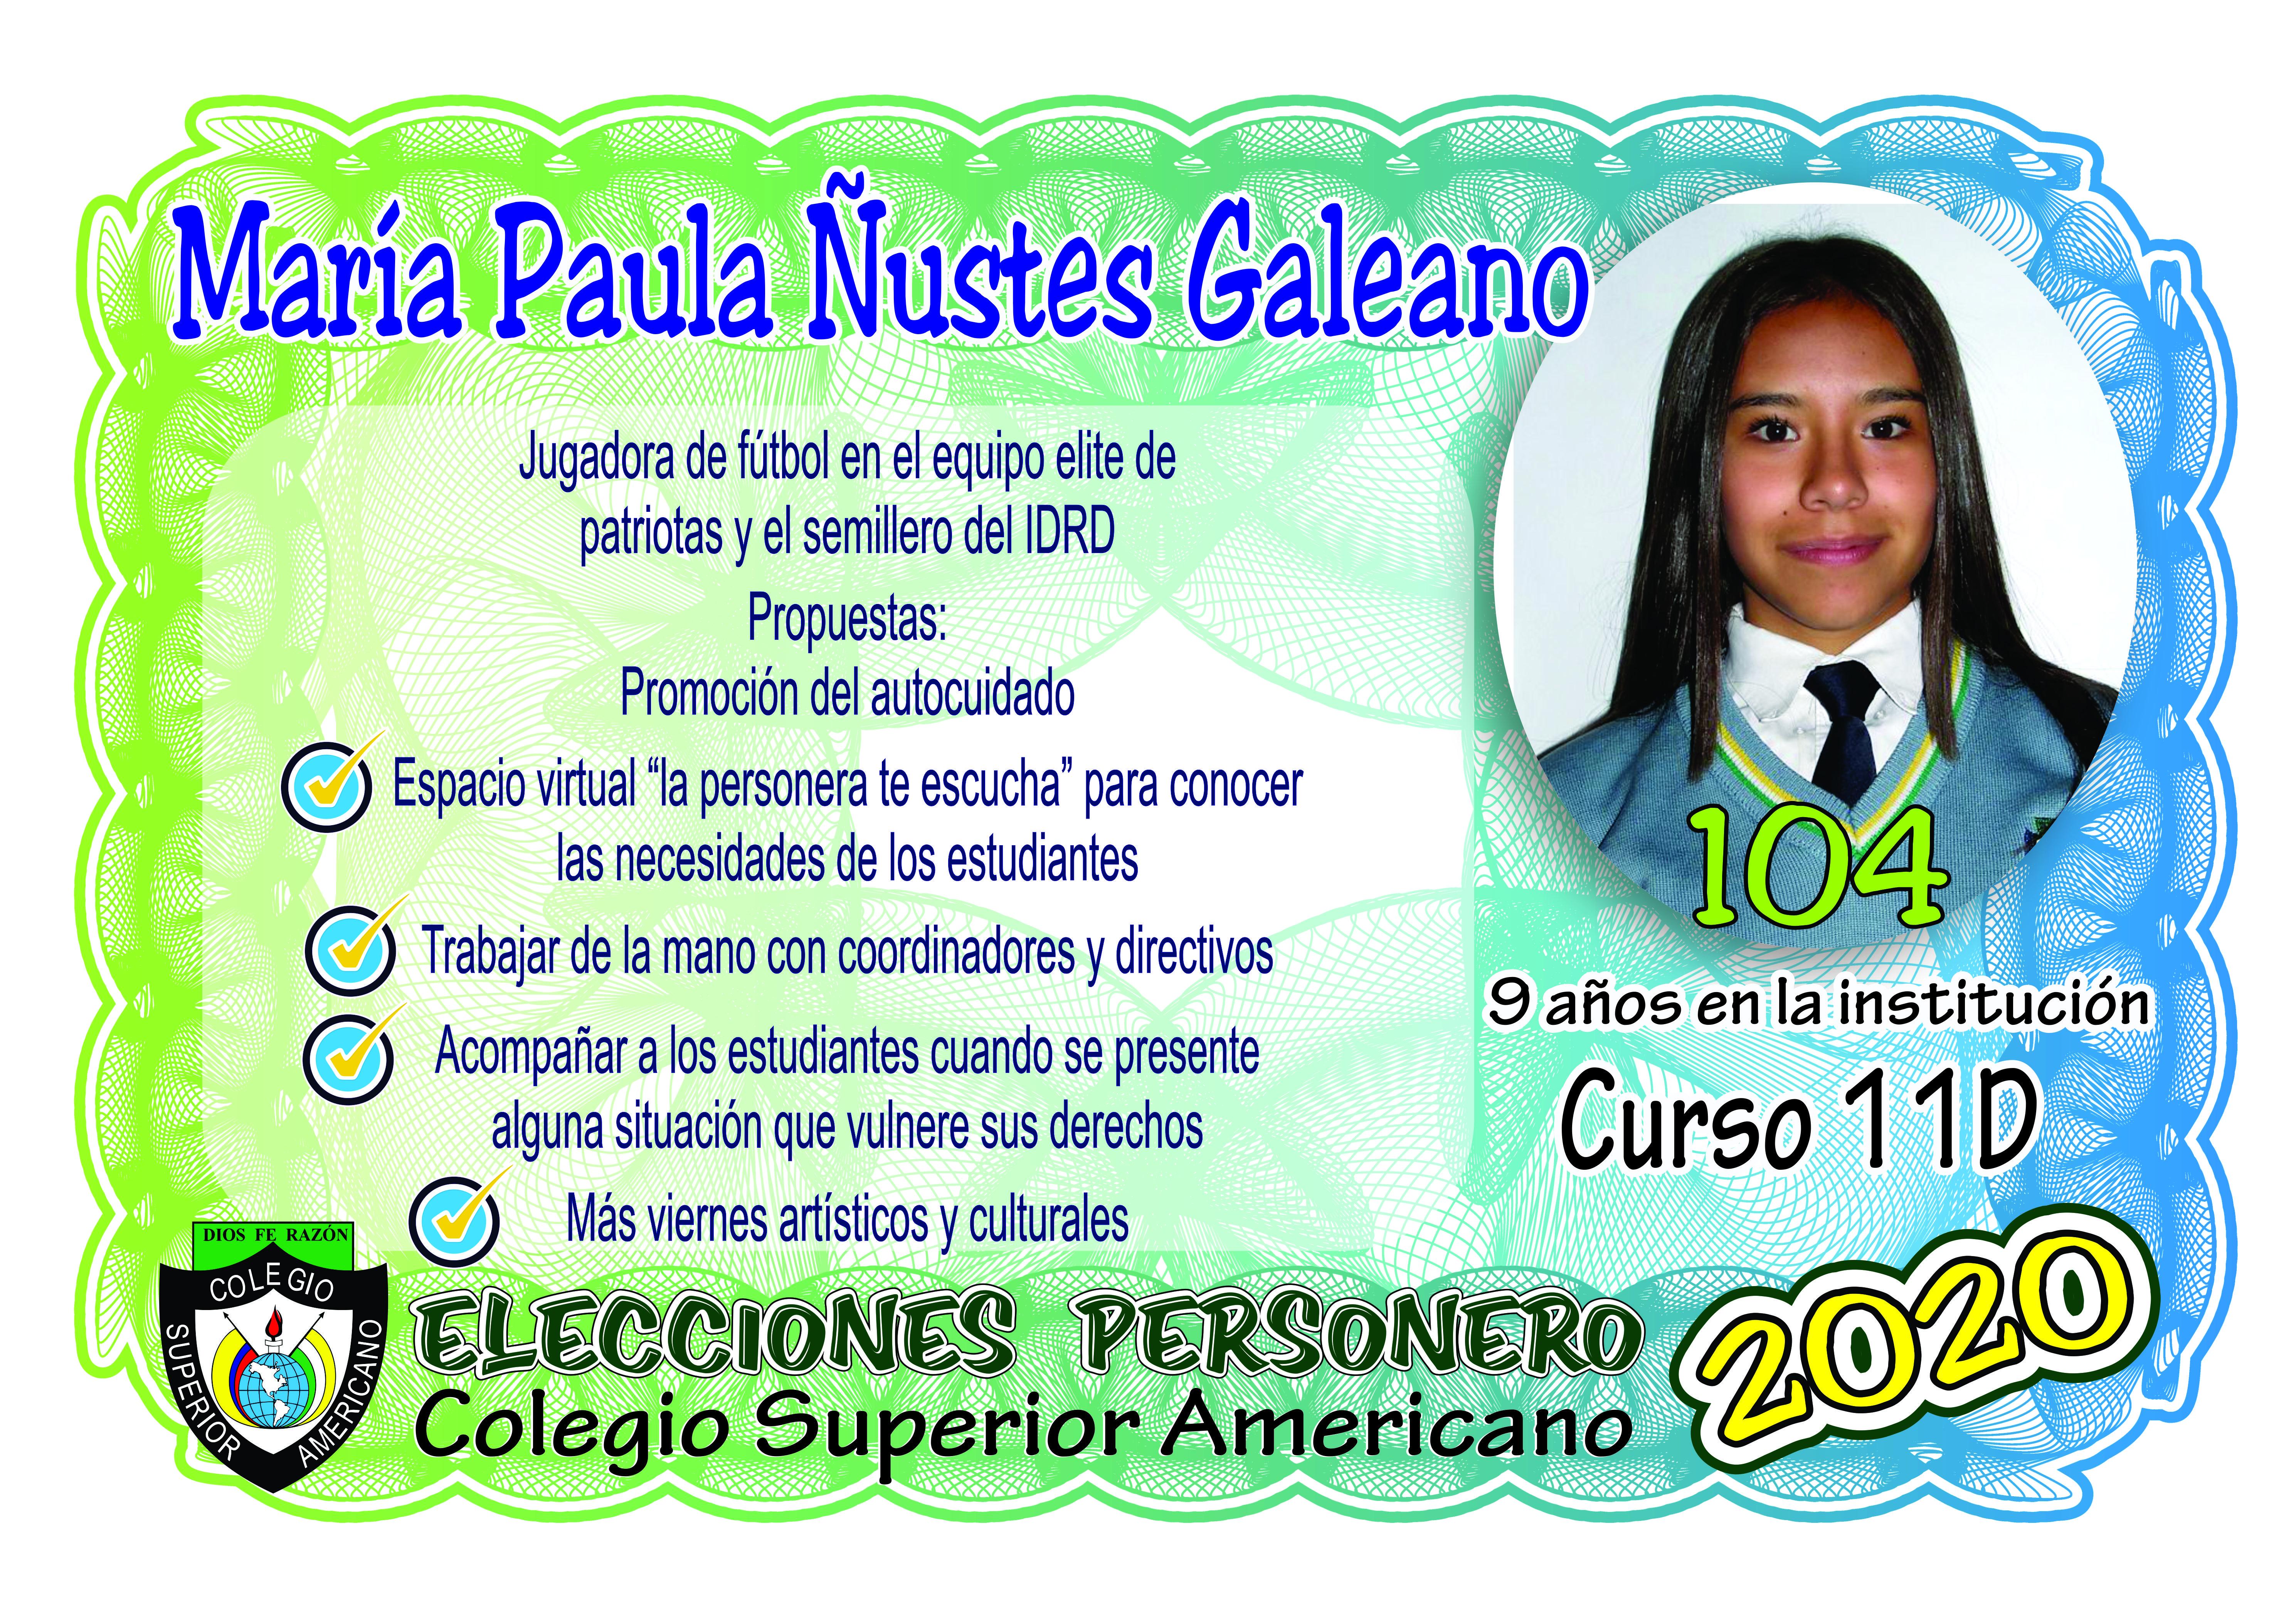 María Paula Ñustes Galeano.jpg